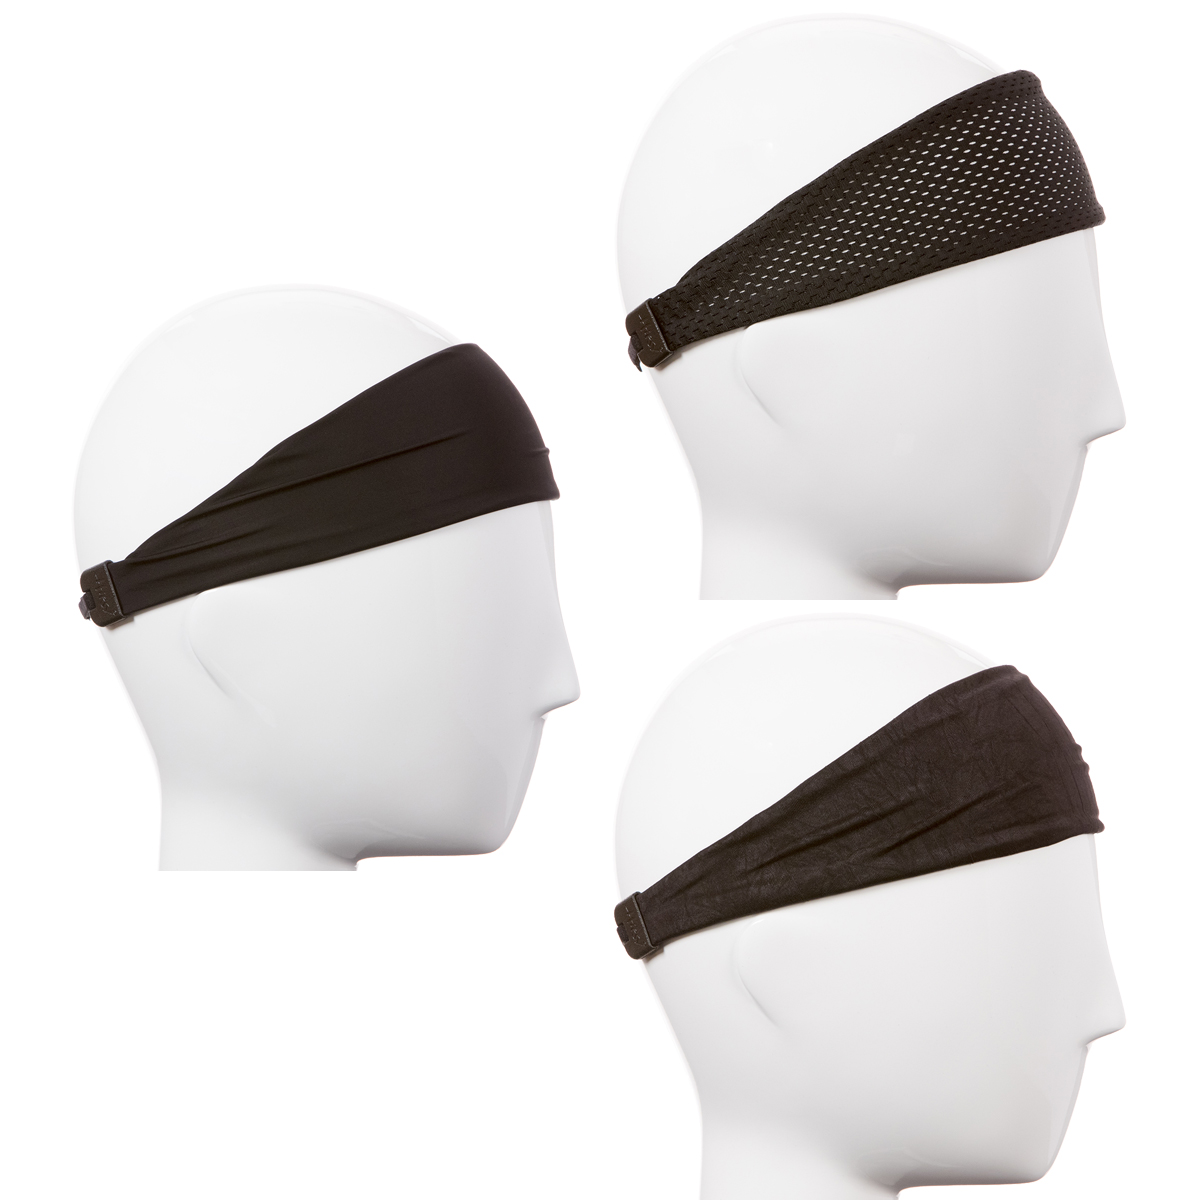 Hipsy Xflex Adjustable & Stretchy Sports Sweat Headbands for Men Gift Pack (Mixed Black Xflex Band 3pk)